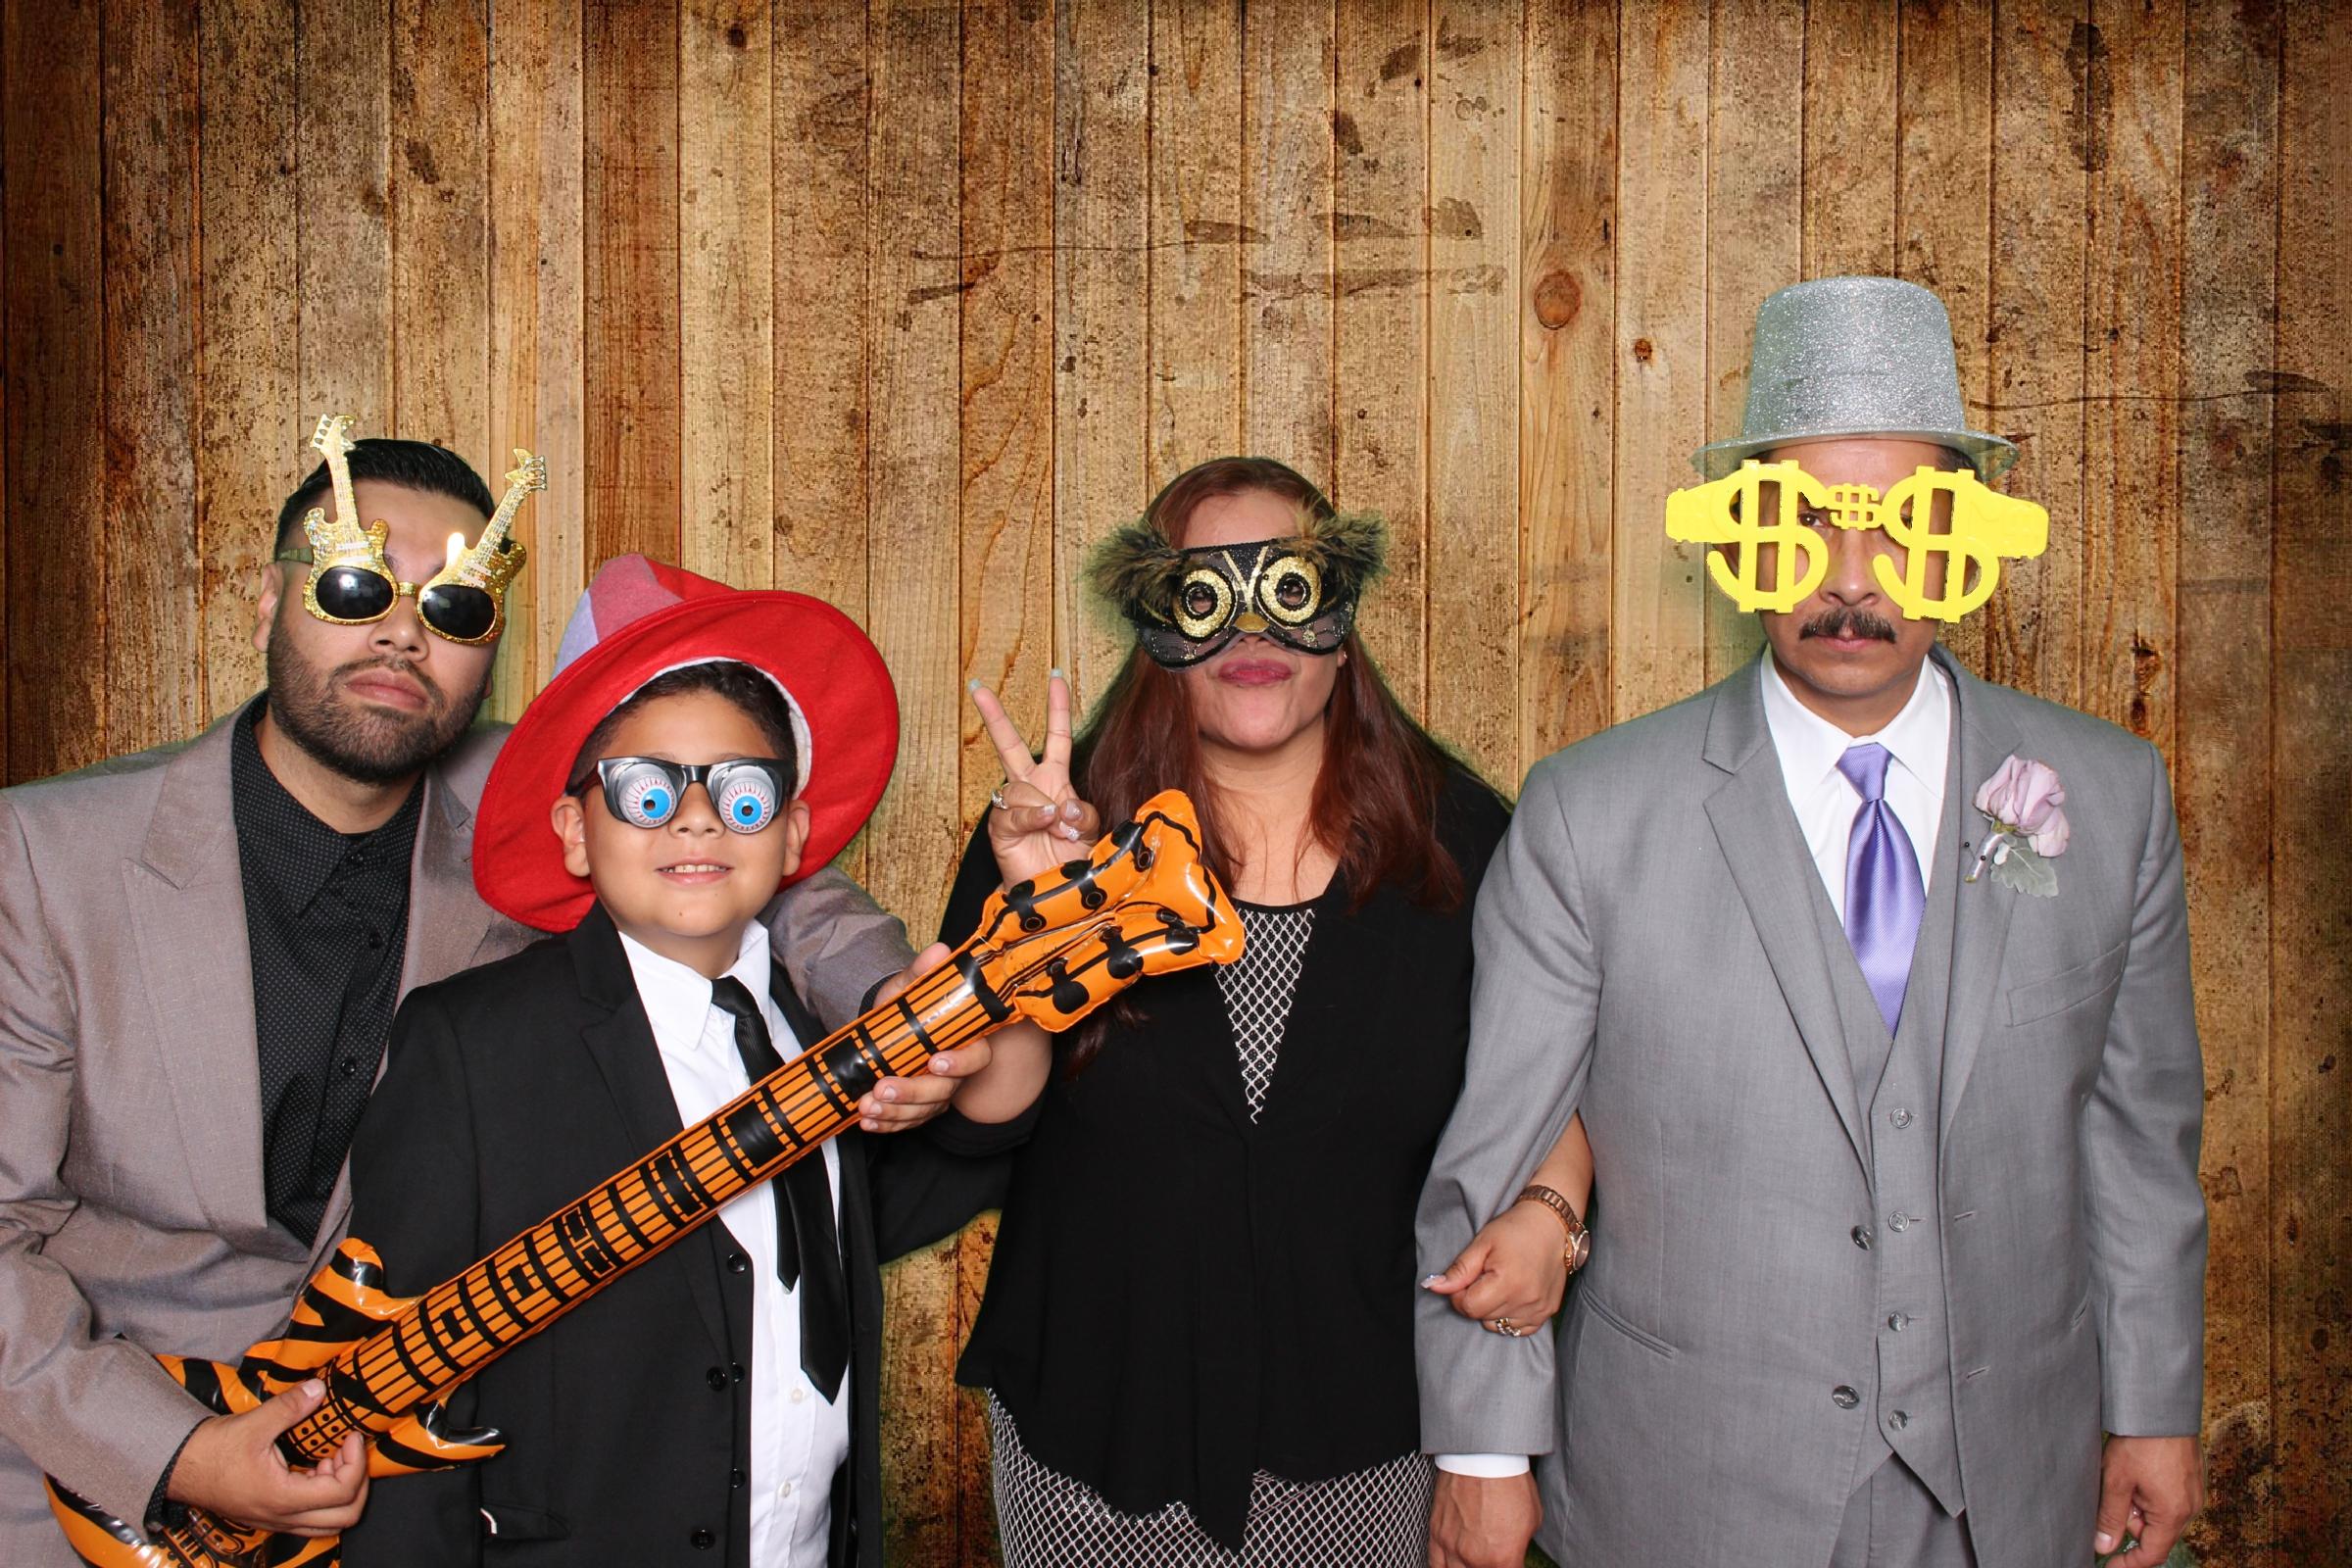 weddings are always fun